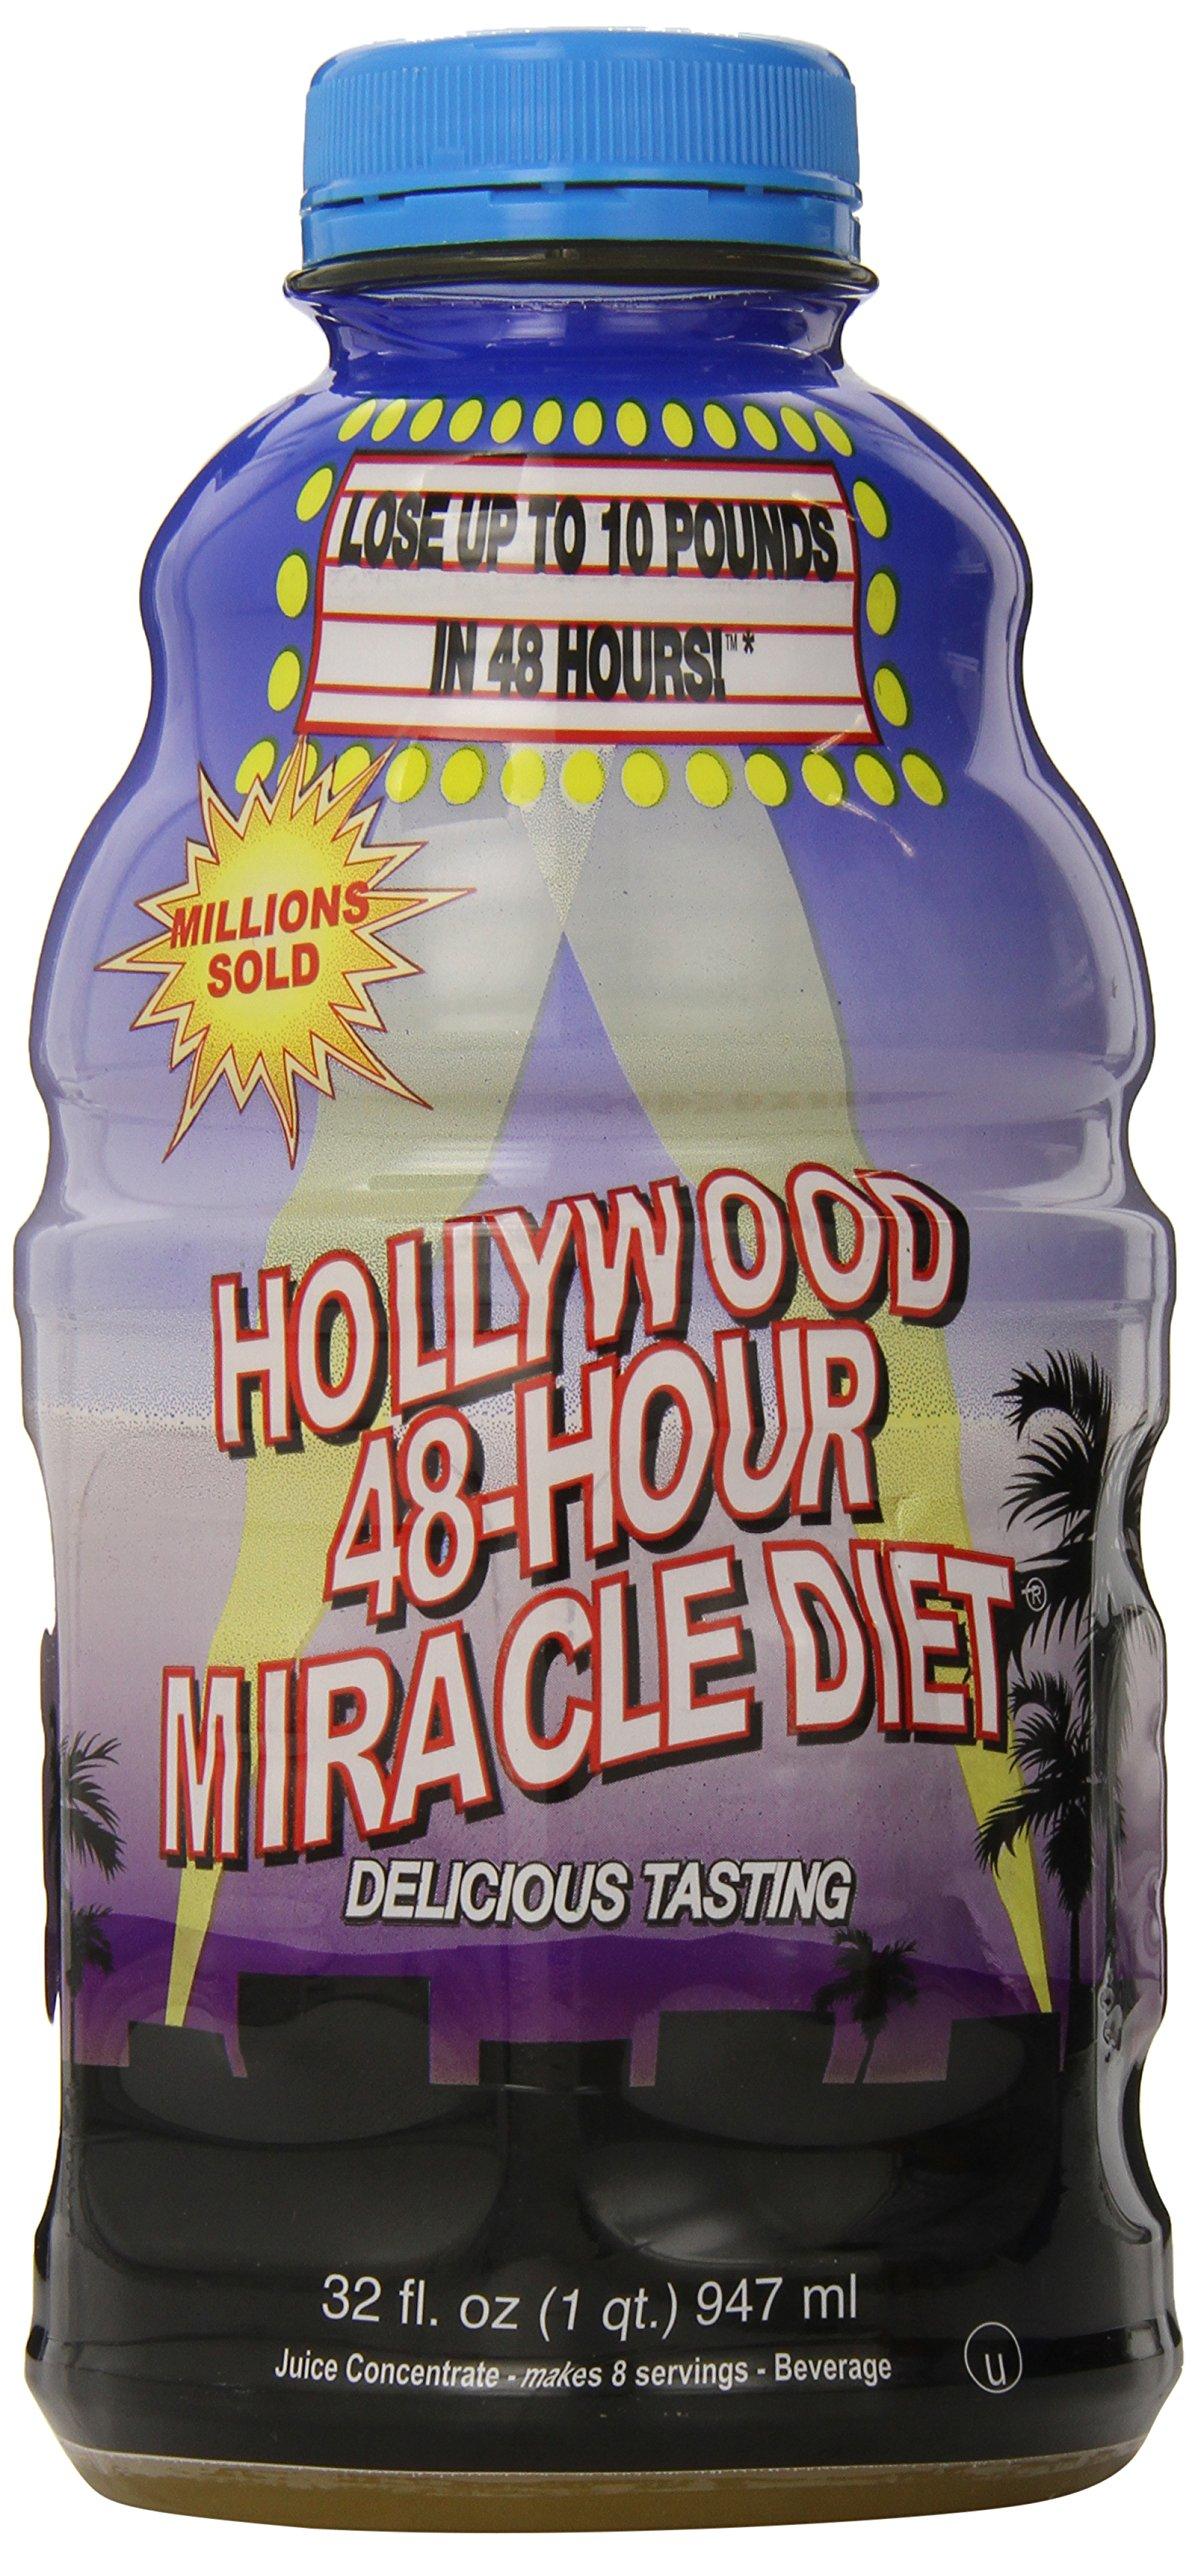 Hollywood Diet Herbal Clean 48-Hour Miracle - 32 fl oz by Hollywood Miracle Diet